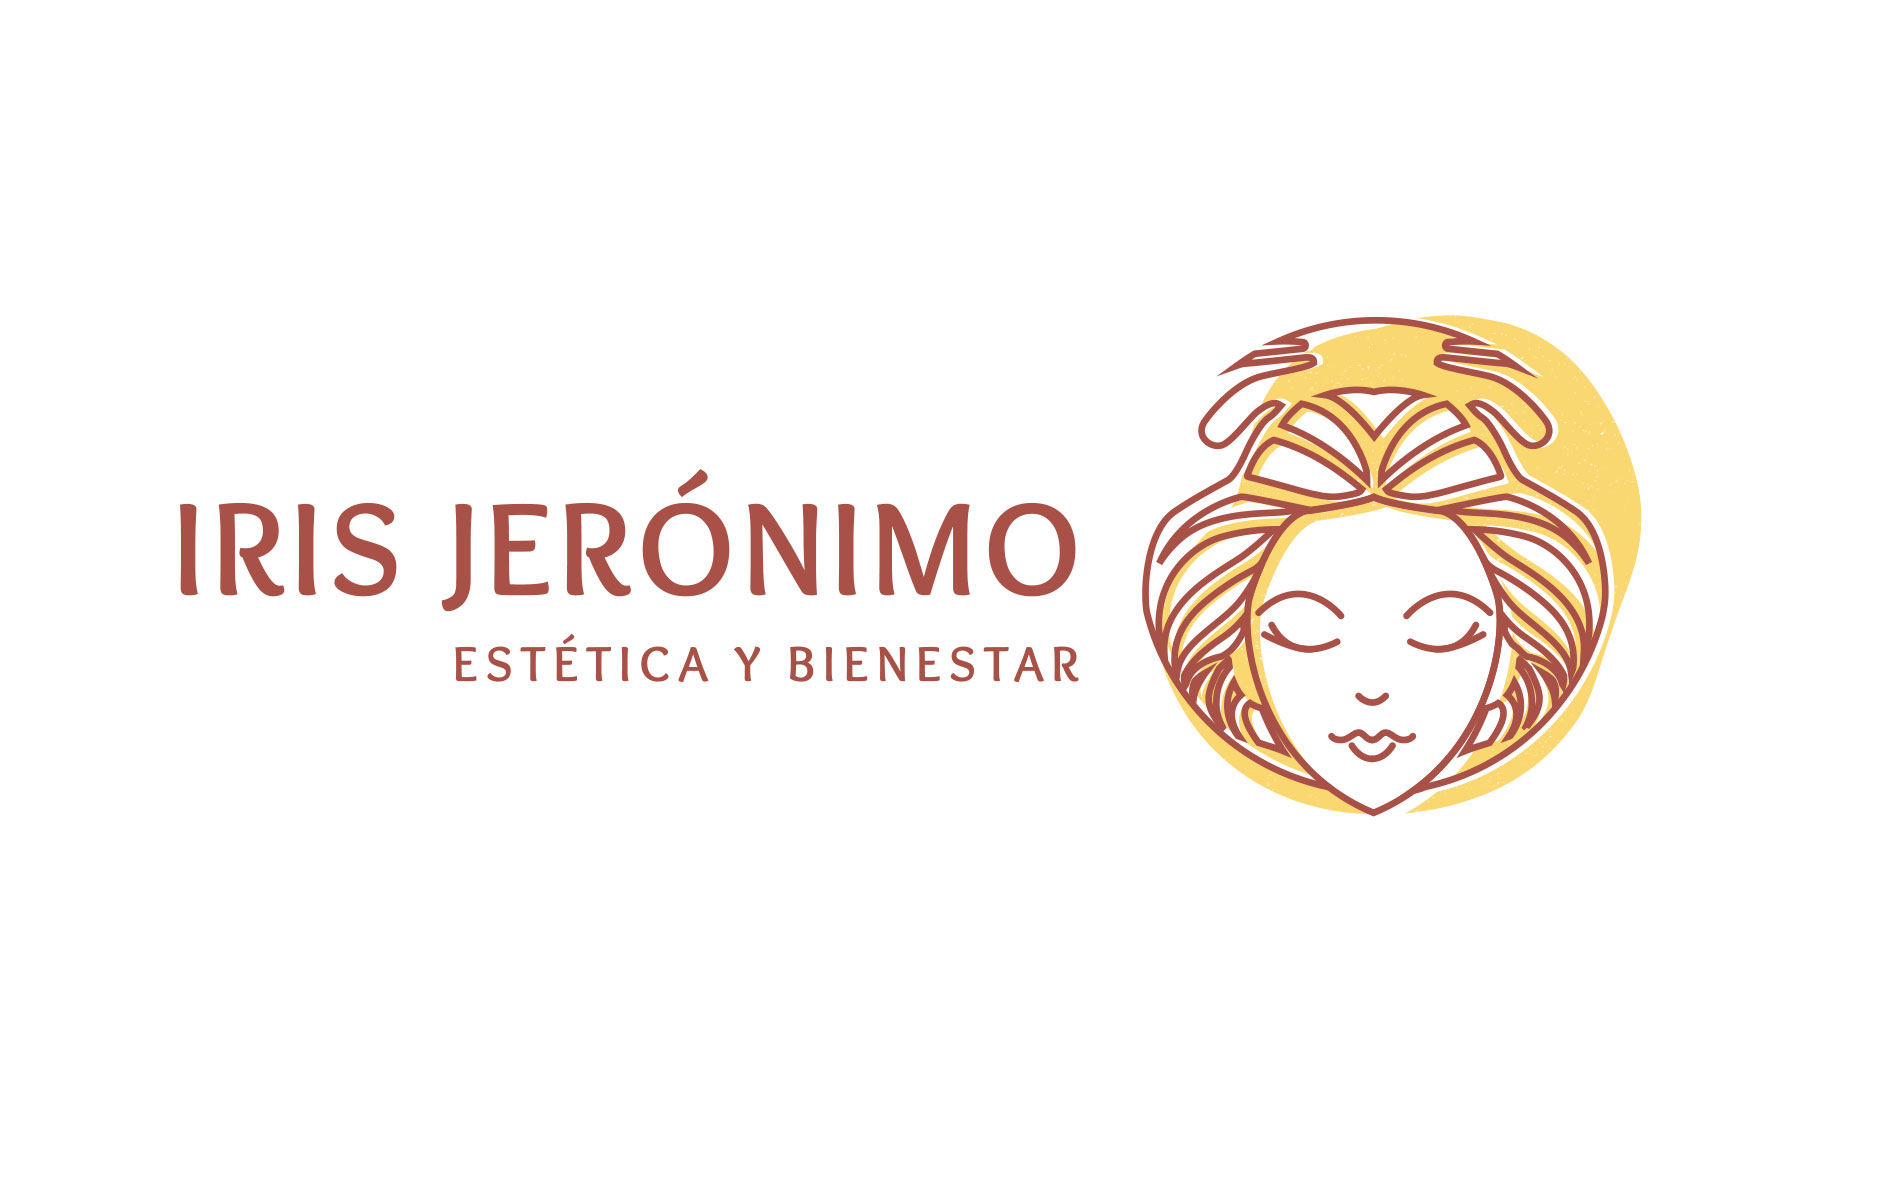 Iris Jerónimo - Diseño de Marca 4